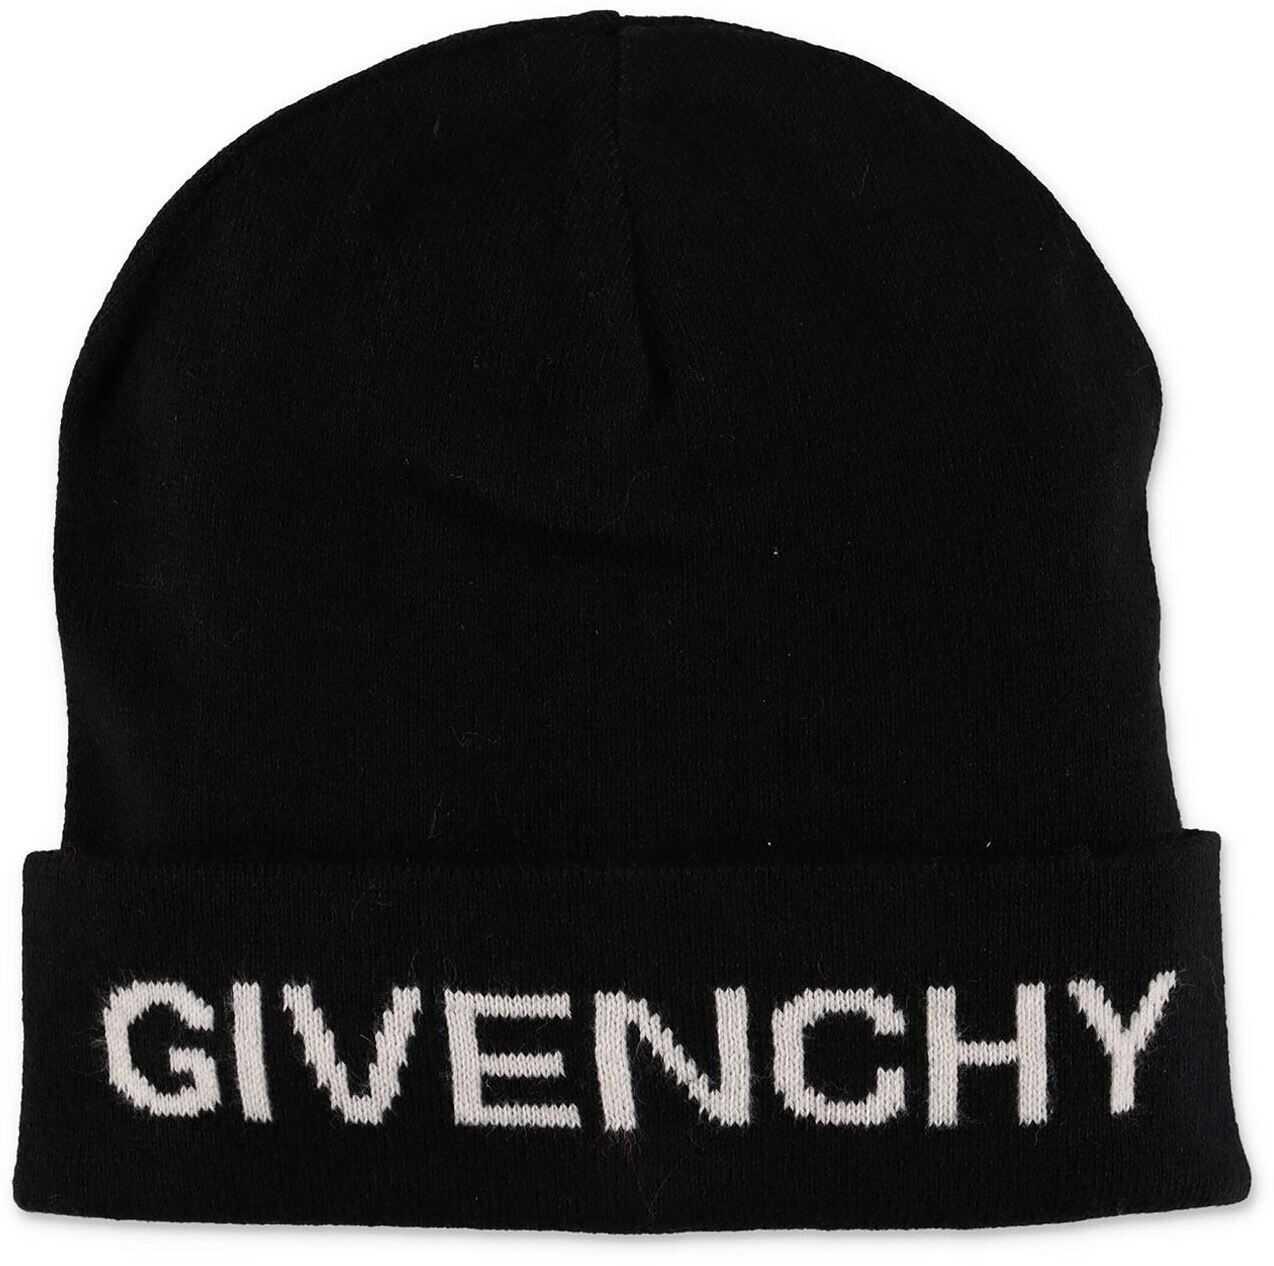 Givenchy Black Beanie With Logo Black